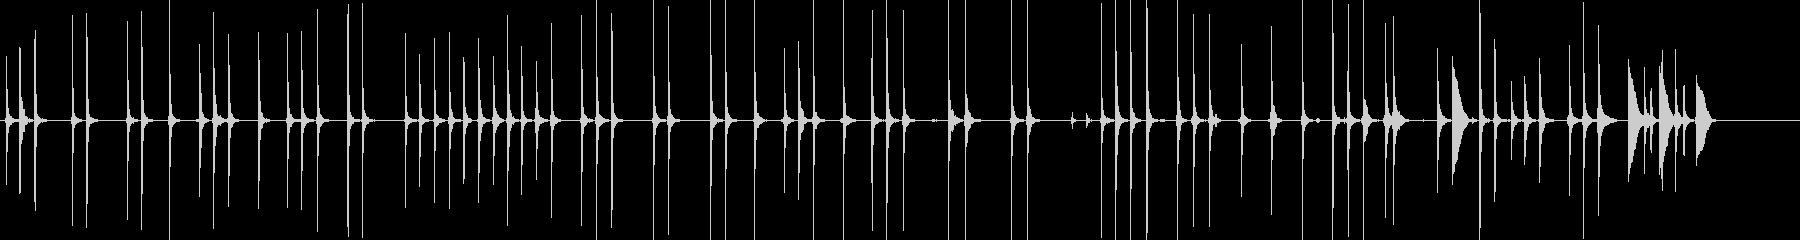 三味線73鷺娘5思い重生音歌舞伎妖怪鷺雪の未再生の波形